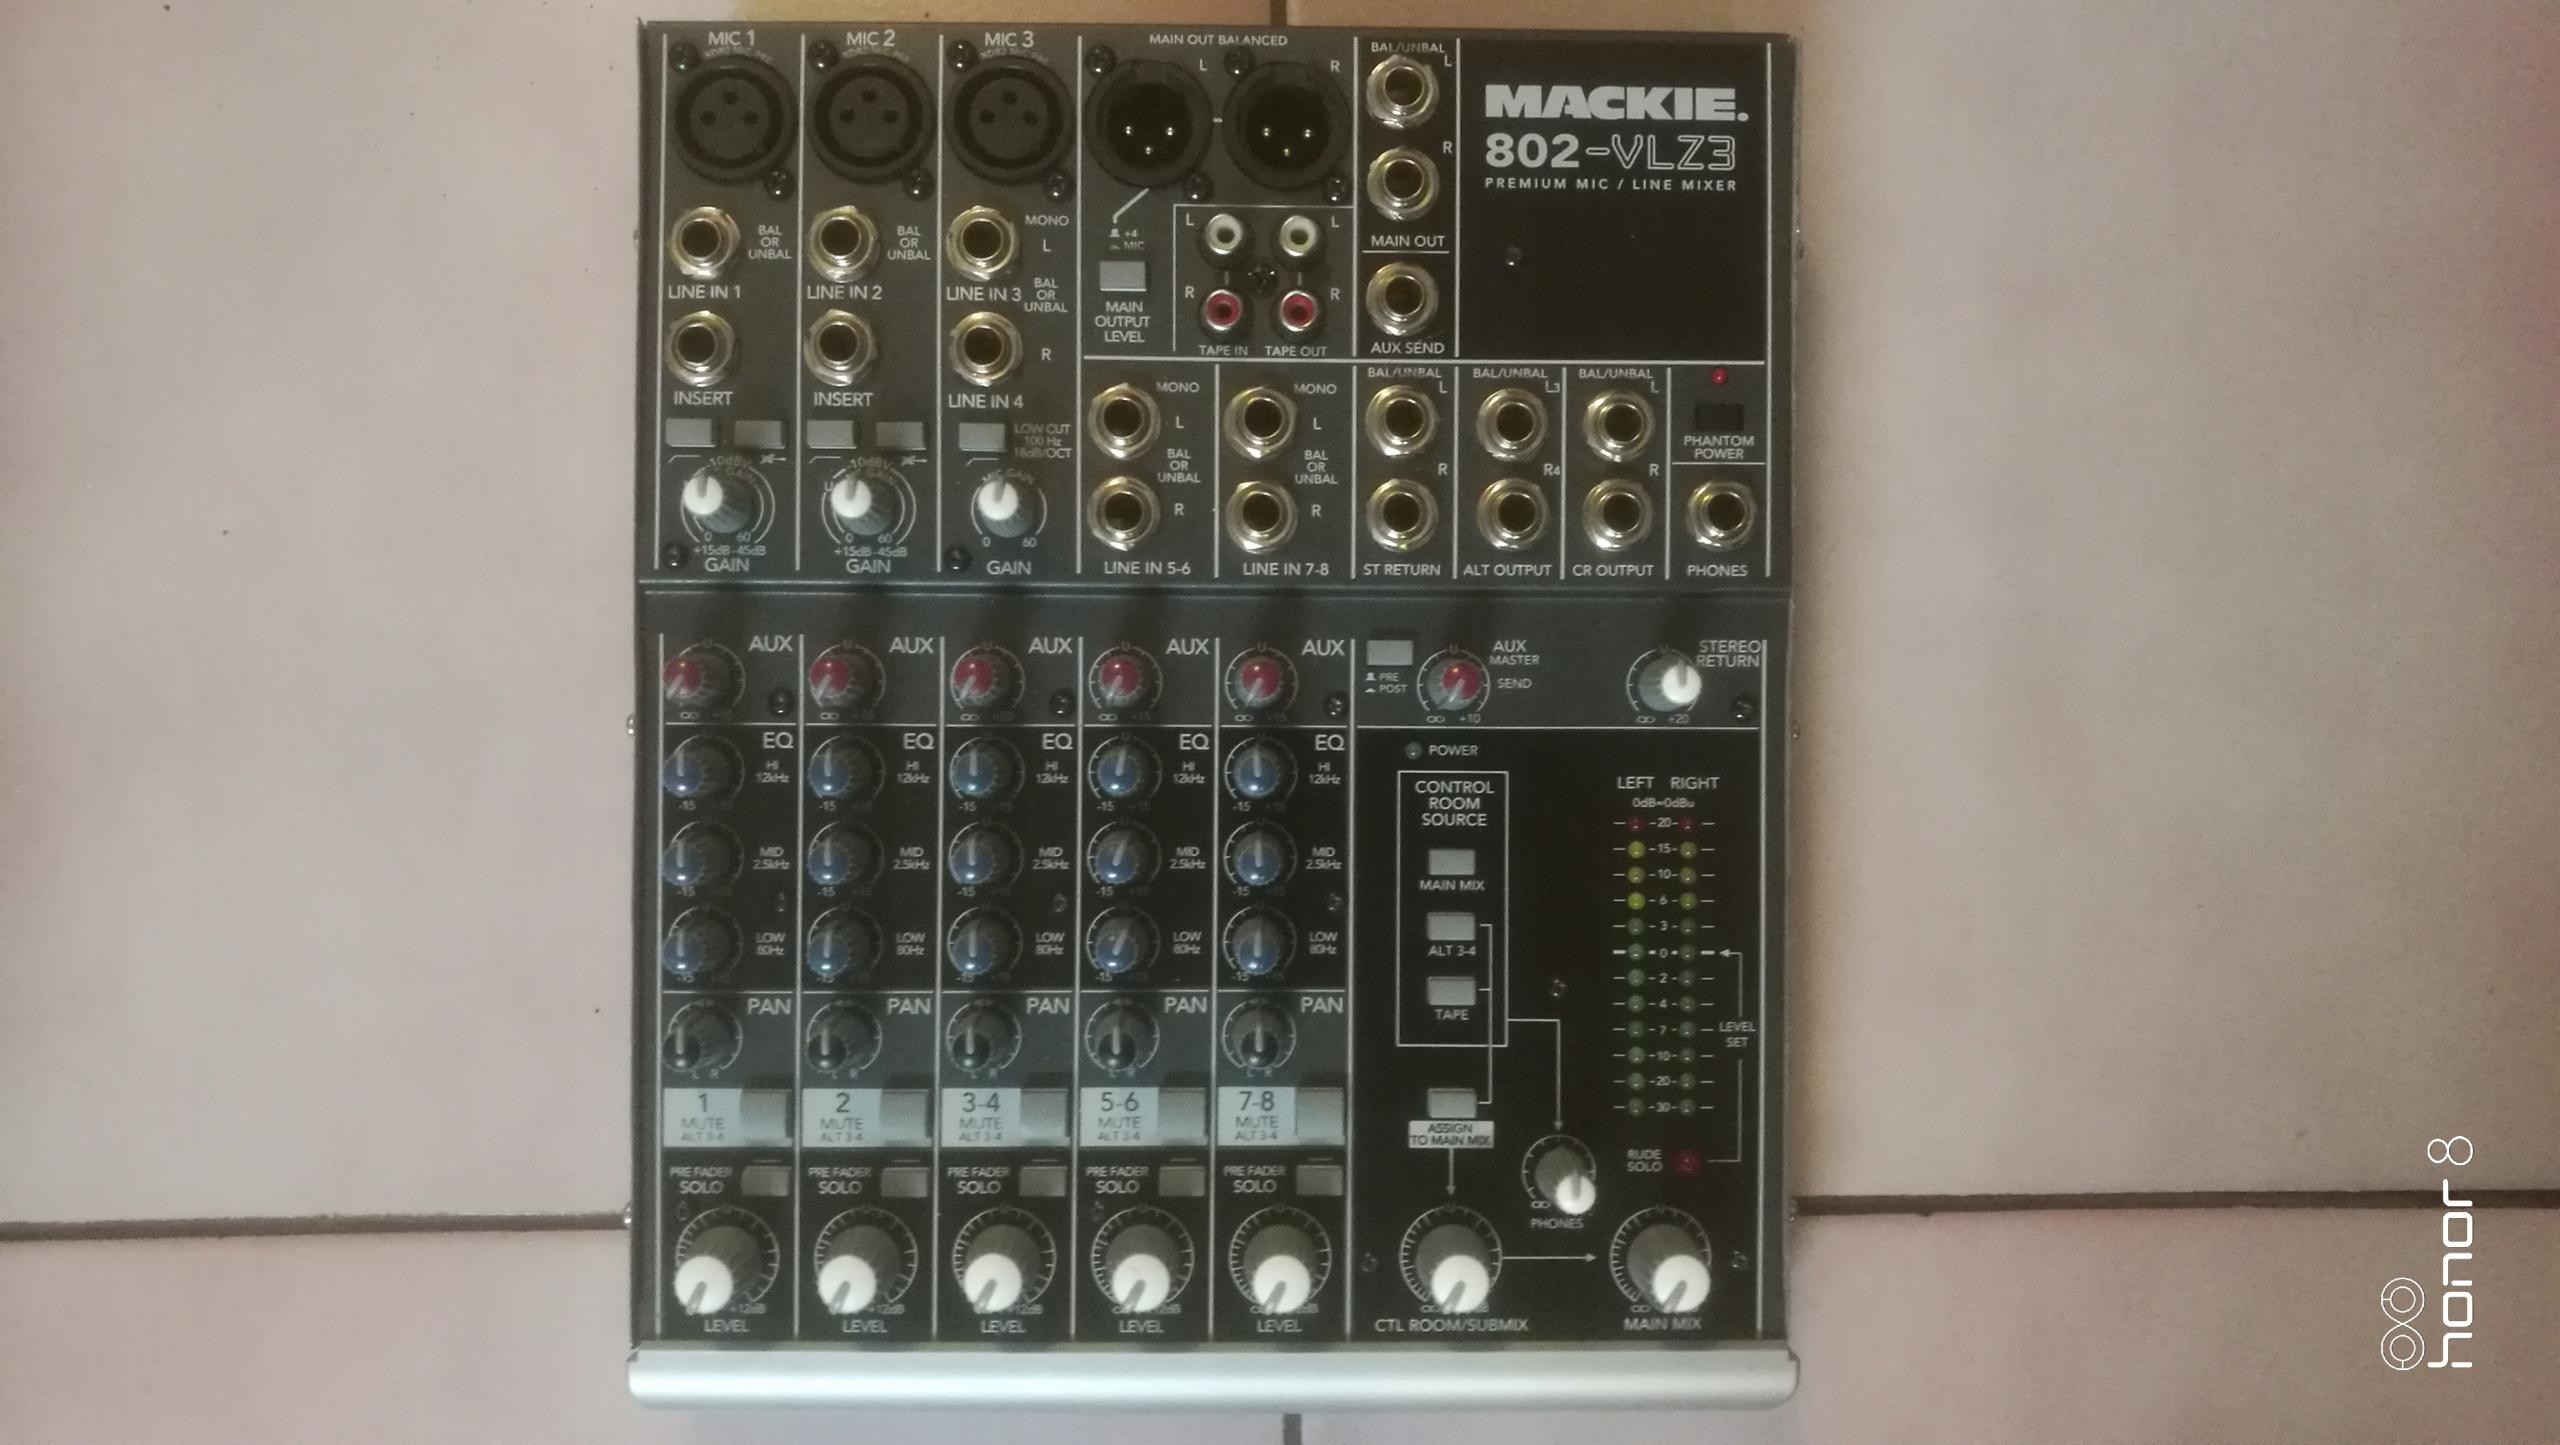 Mixer - Mackie 802 - VLZ3